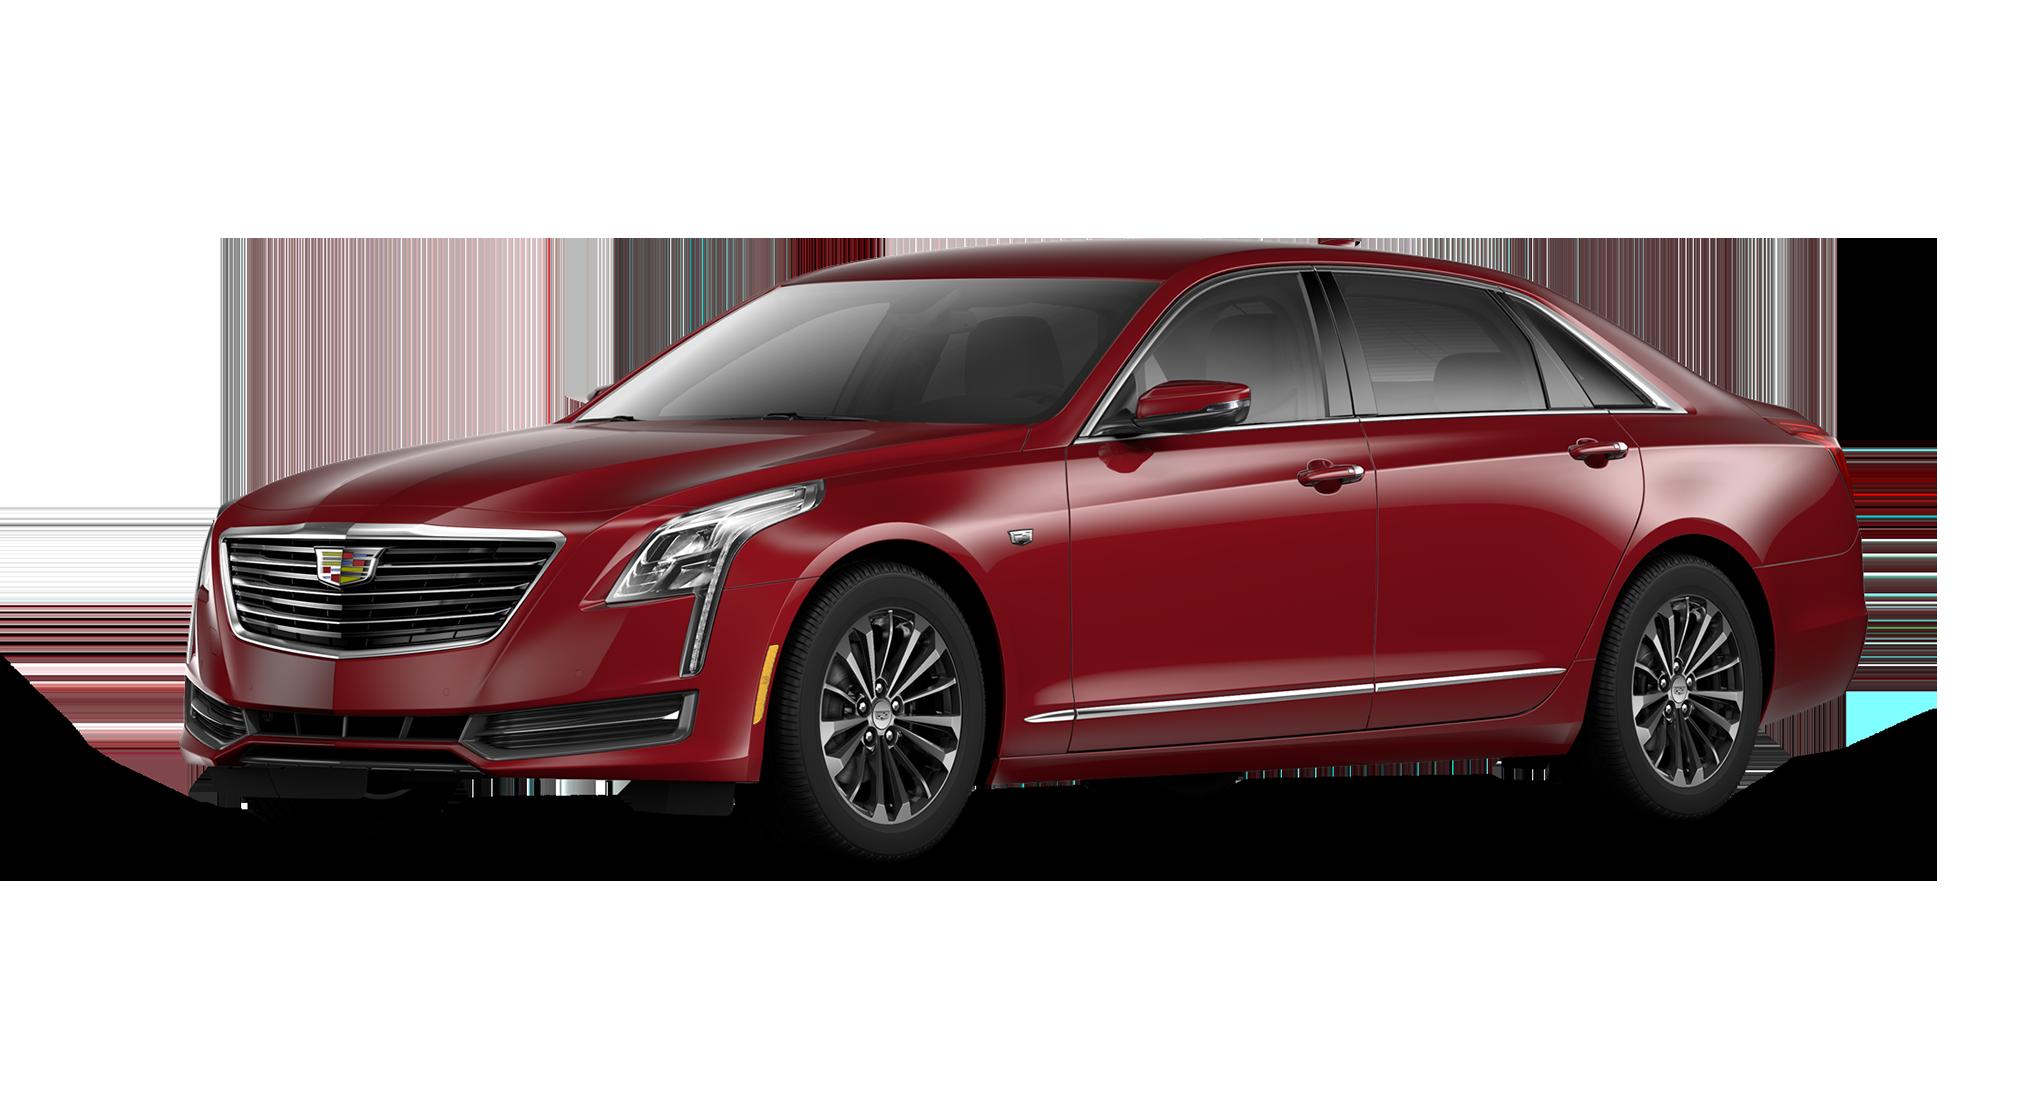 2017 Cadillac Ct6 Winnipeg Ct6 Details Amp Specs Gauthier